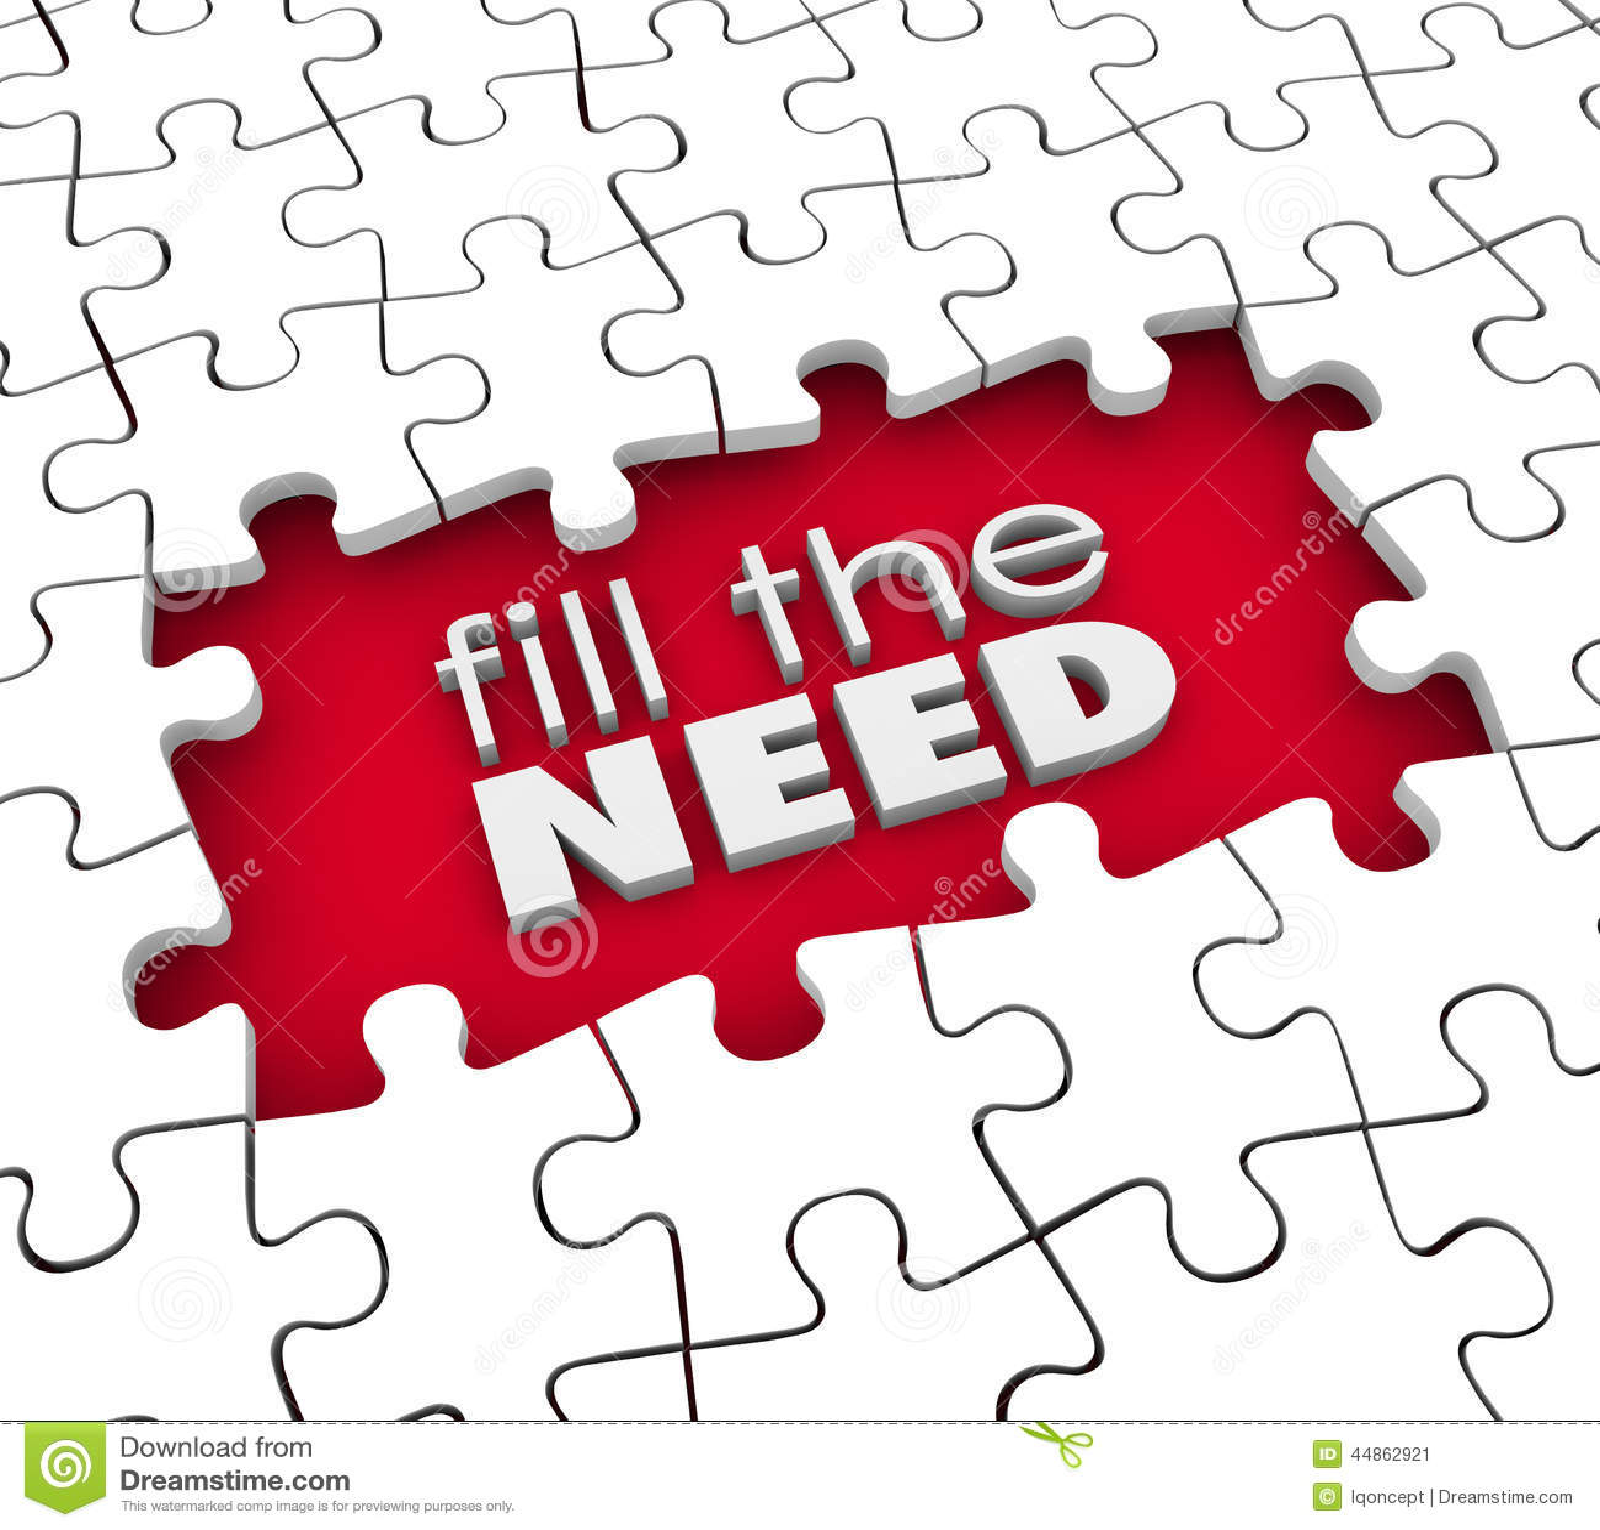 fill the need customer demands product service marketing customer service clip art free customer service clip art free